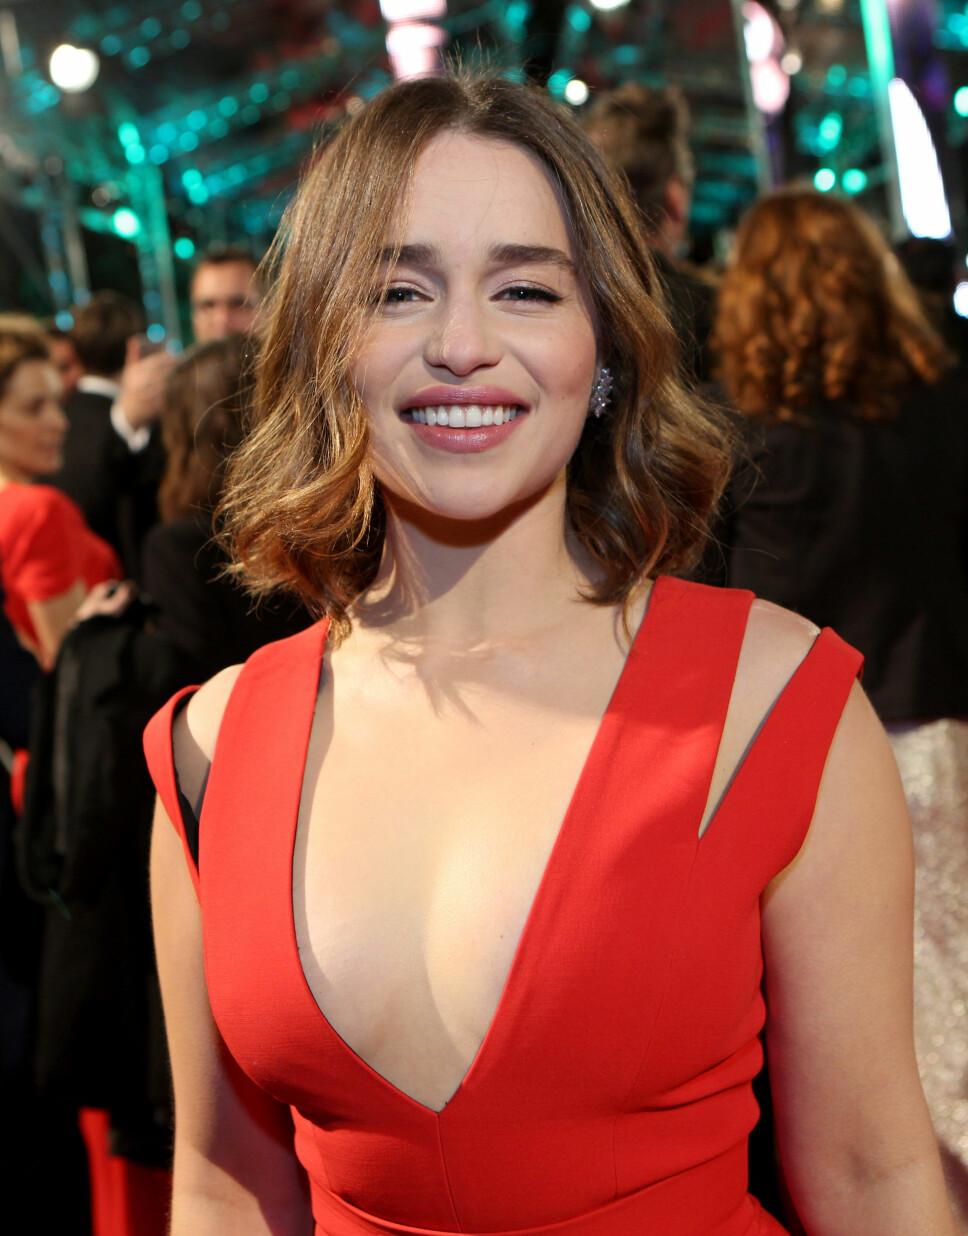 VIL IKKE TA SELFIES: Emilia Clarke forteller i Jessie Wares podcast «Table Manners» at hun ikke ønsker å ta flere fan-selfies.